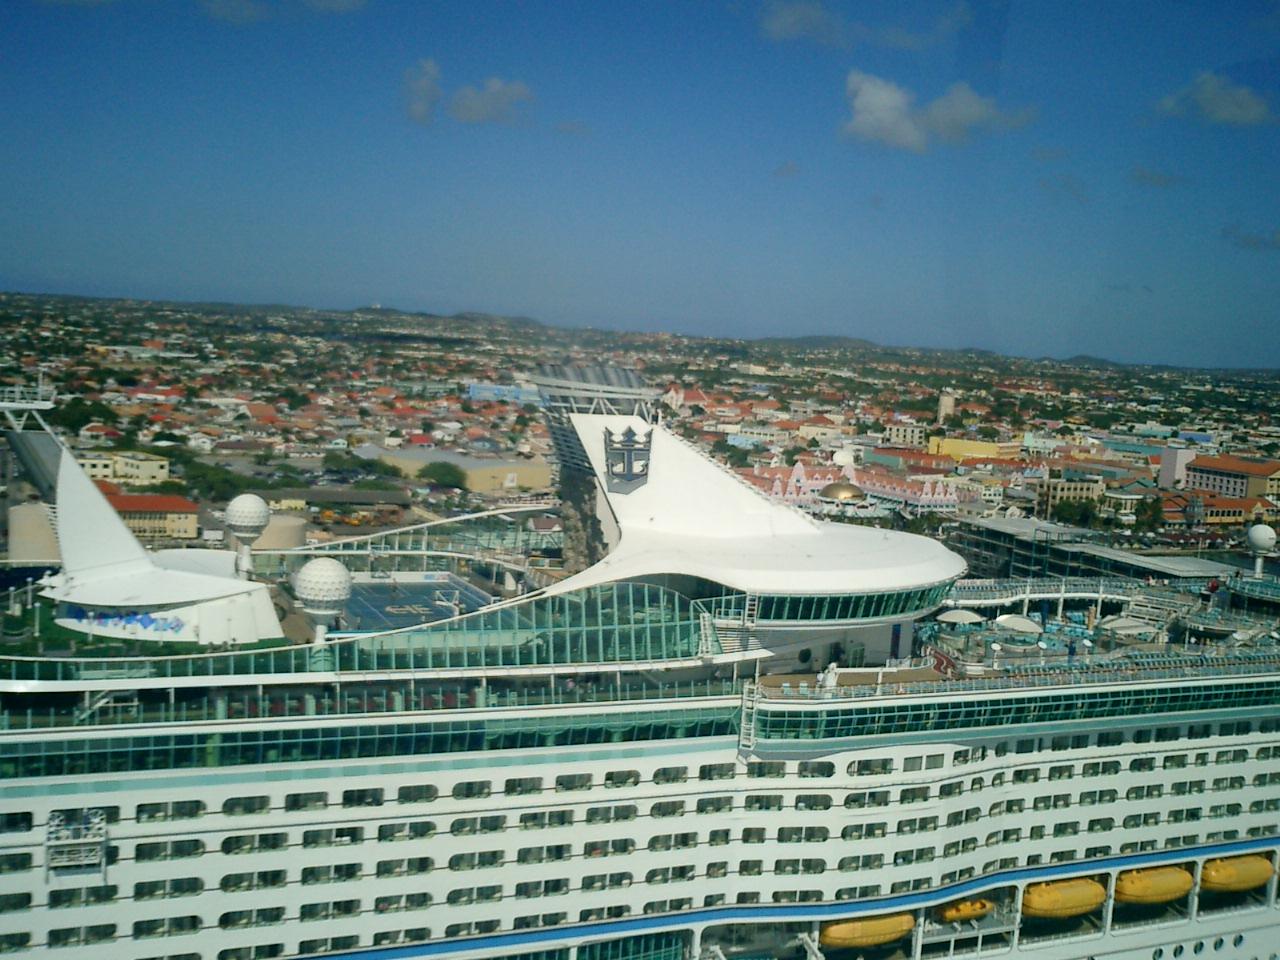 FileAruba Cruise Ship Terminal Panoramiojpg Wikimedia Commons - Cruise ships in aruba